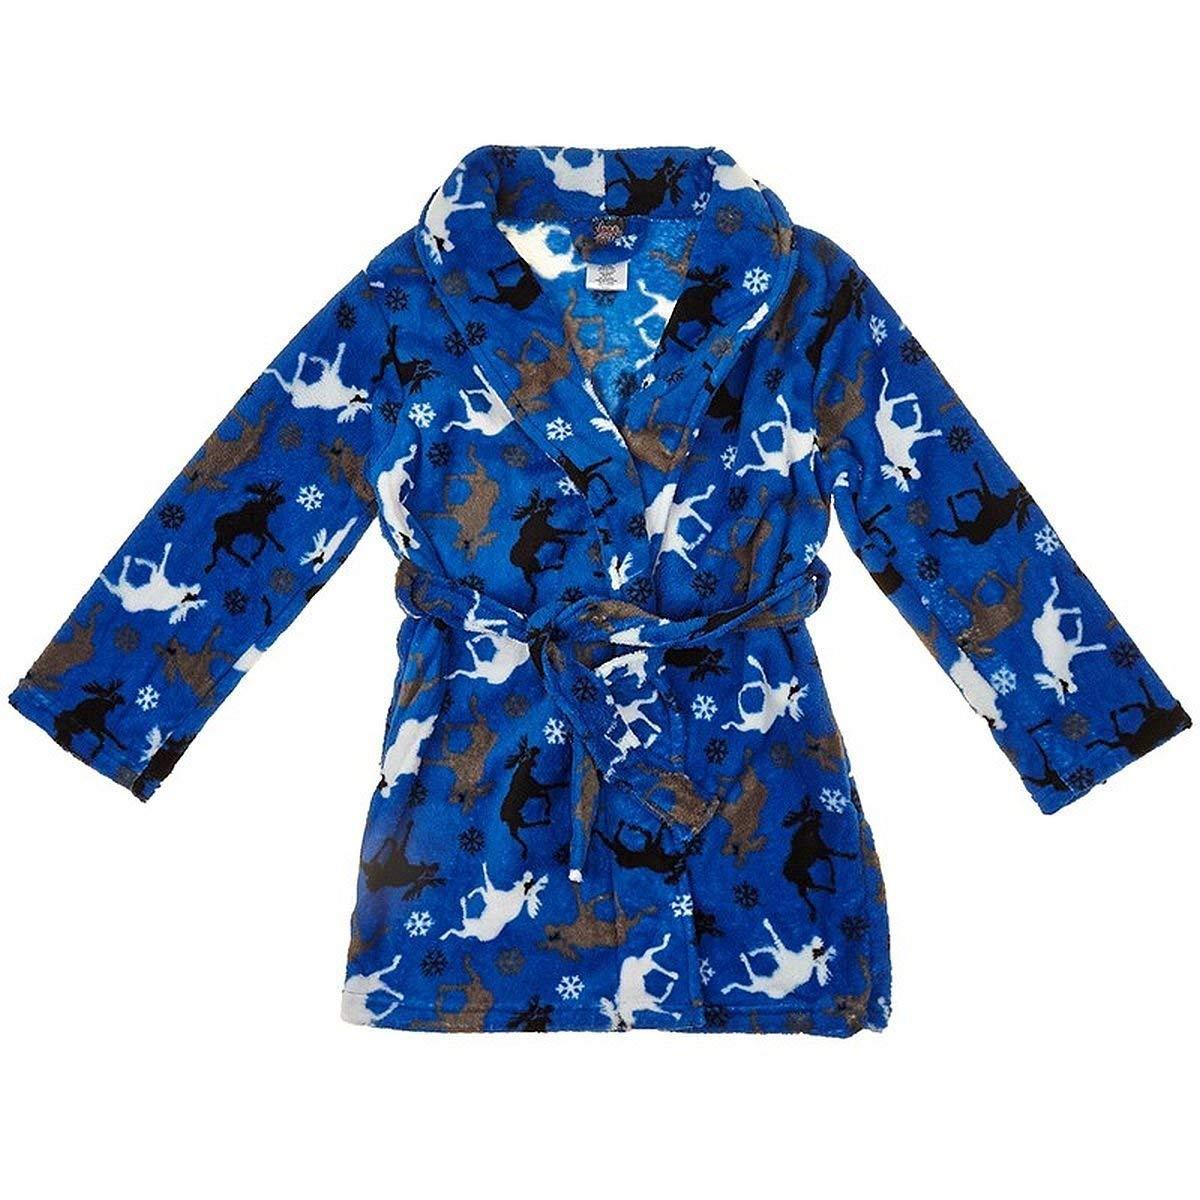 Boy's Plush Royal Blue Moose and Snowflake Fleece Bathrobe, Robe